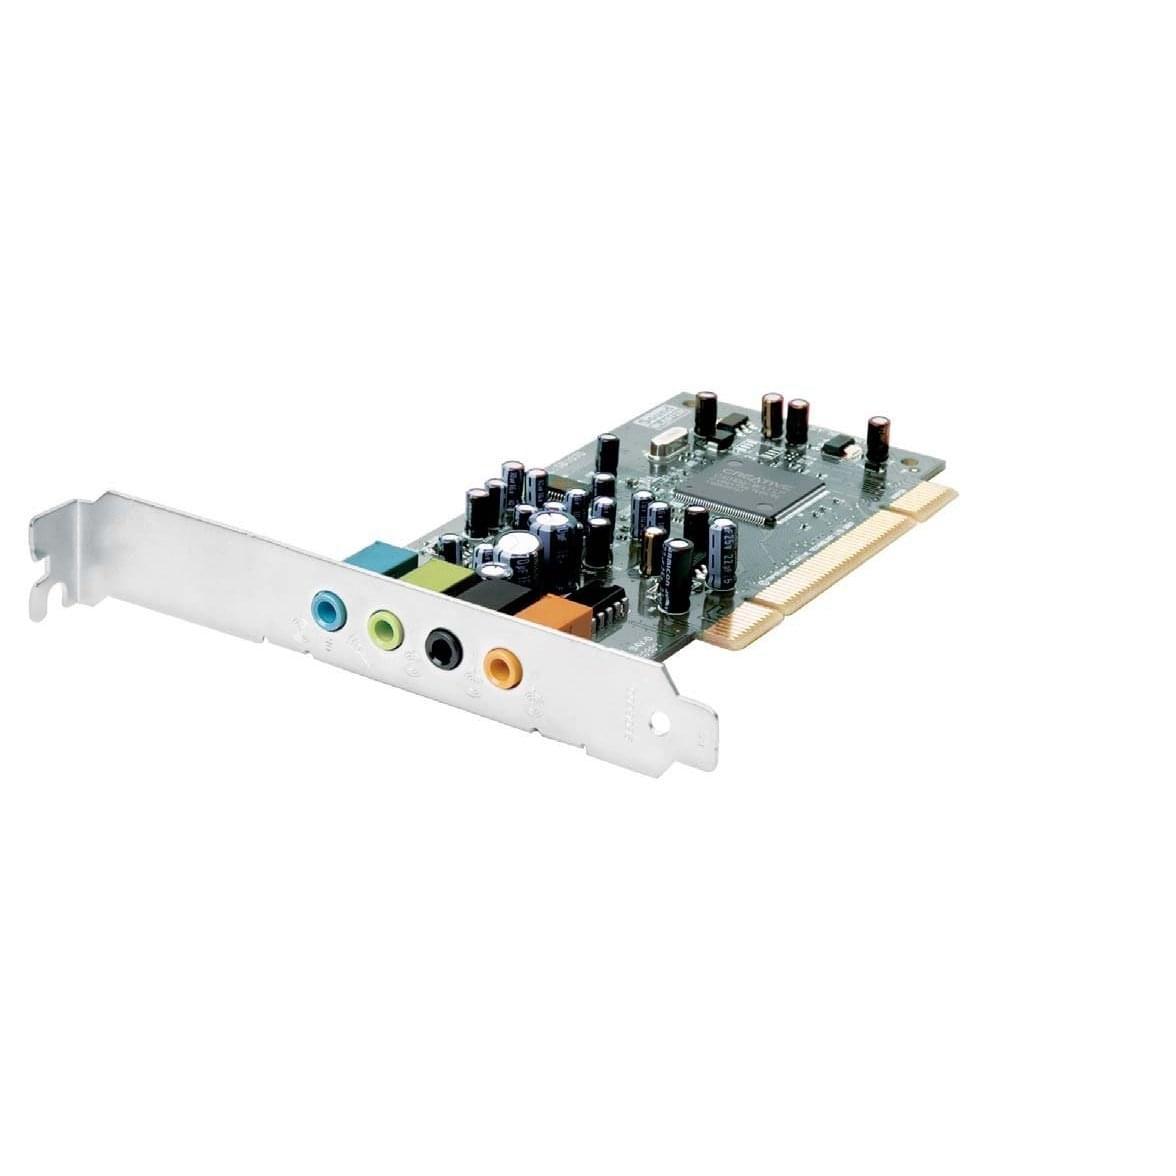 Creative Sound Blaster 5.1 VX PCI OEM (30SB107100000) - Achat / Vente Carte Son sur Cybertek.fr - 0